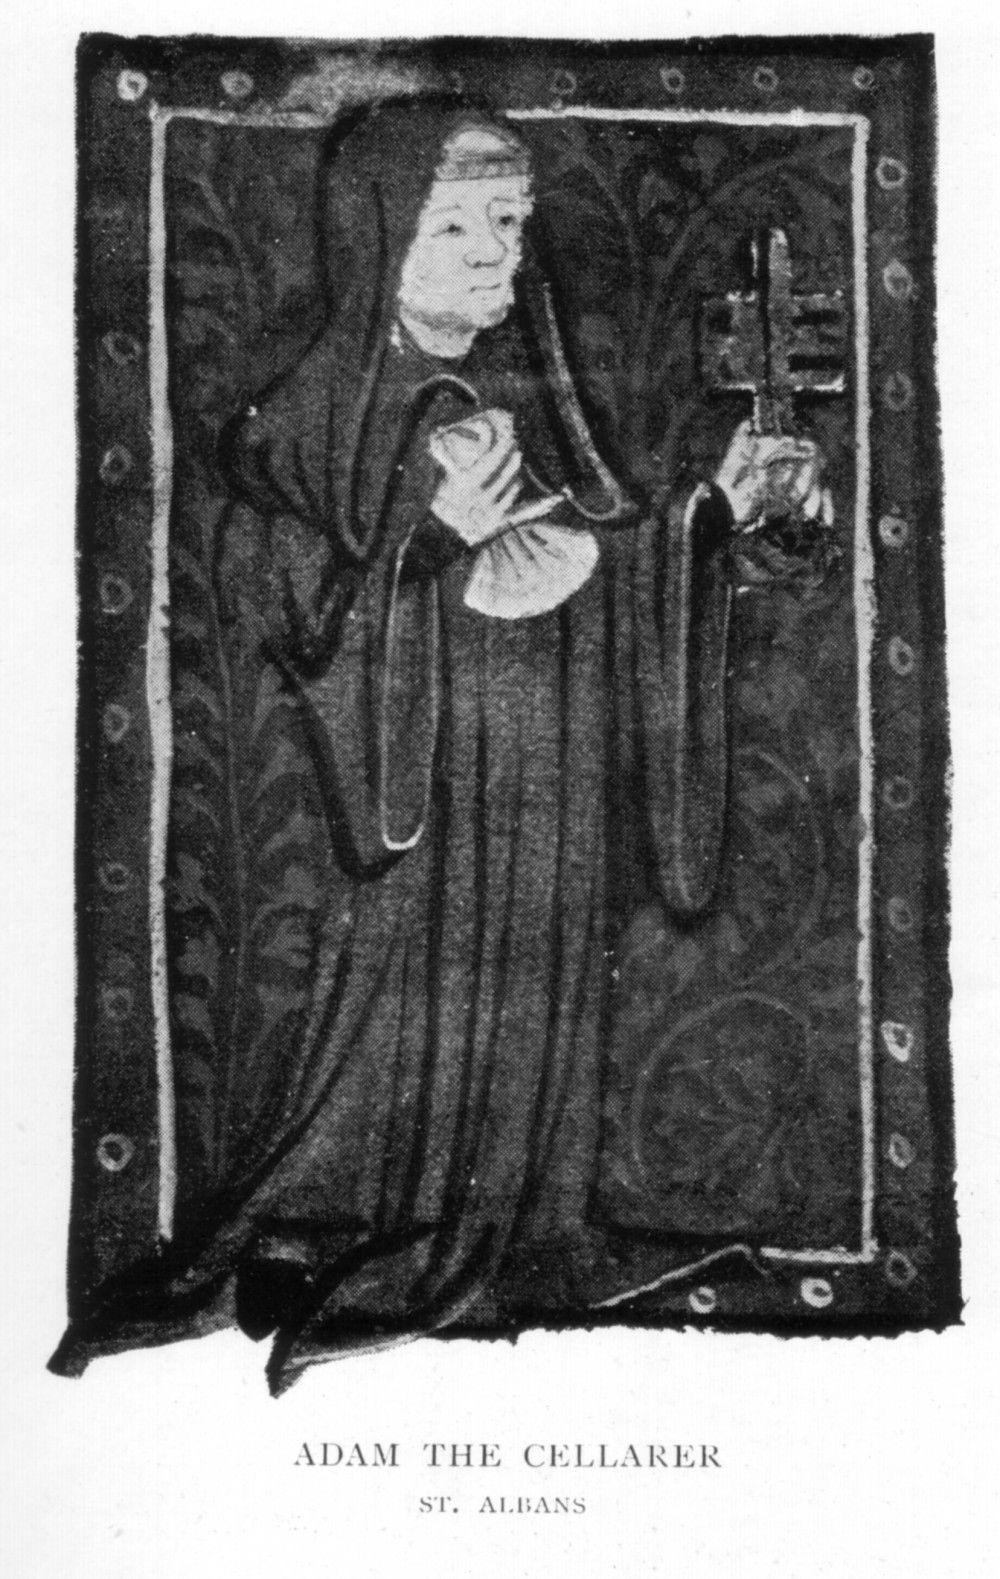 Adam the Cellarer, St. Alban's